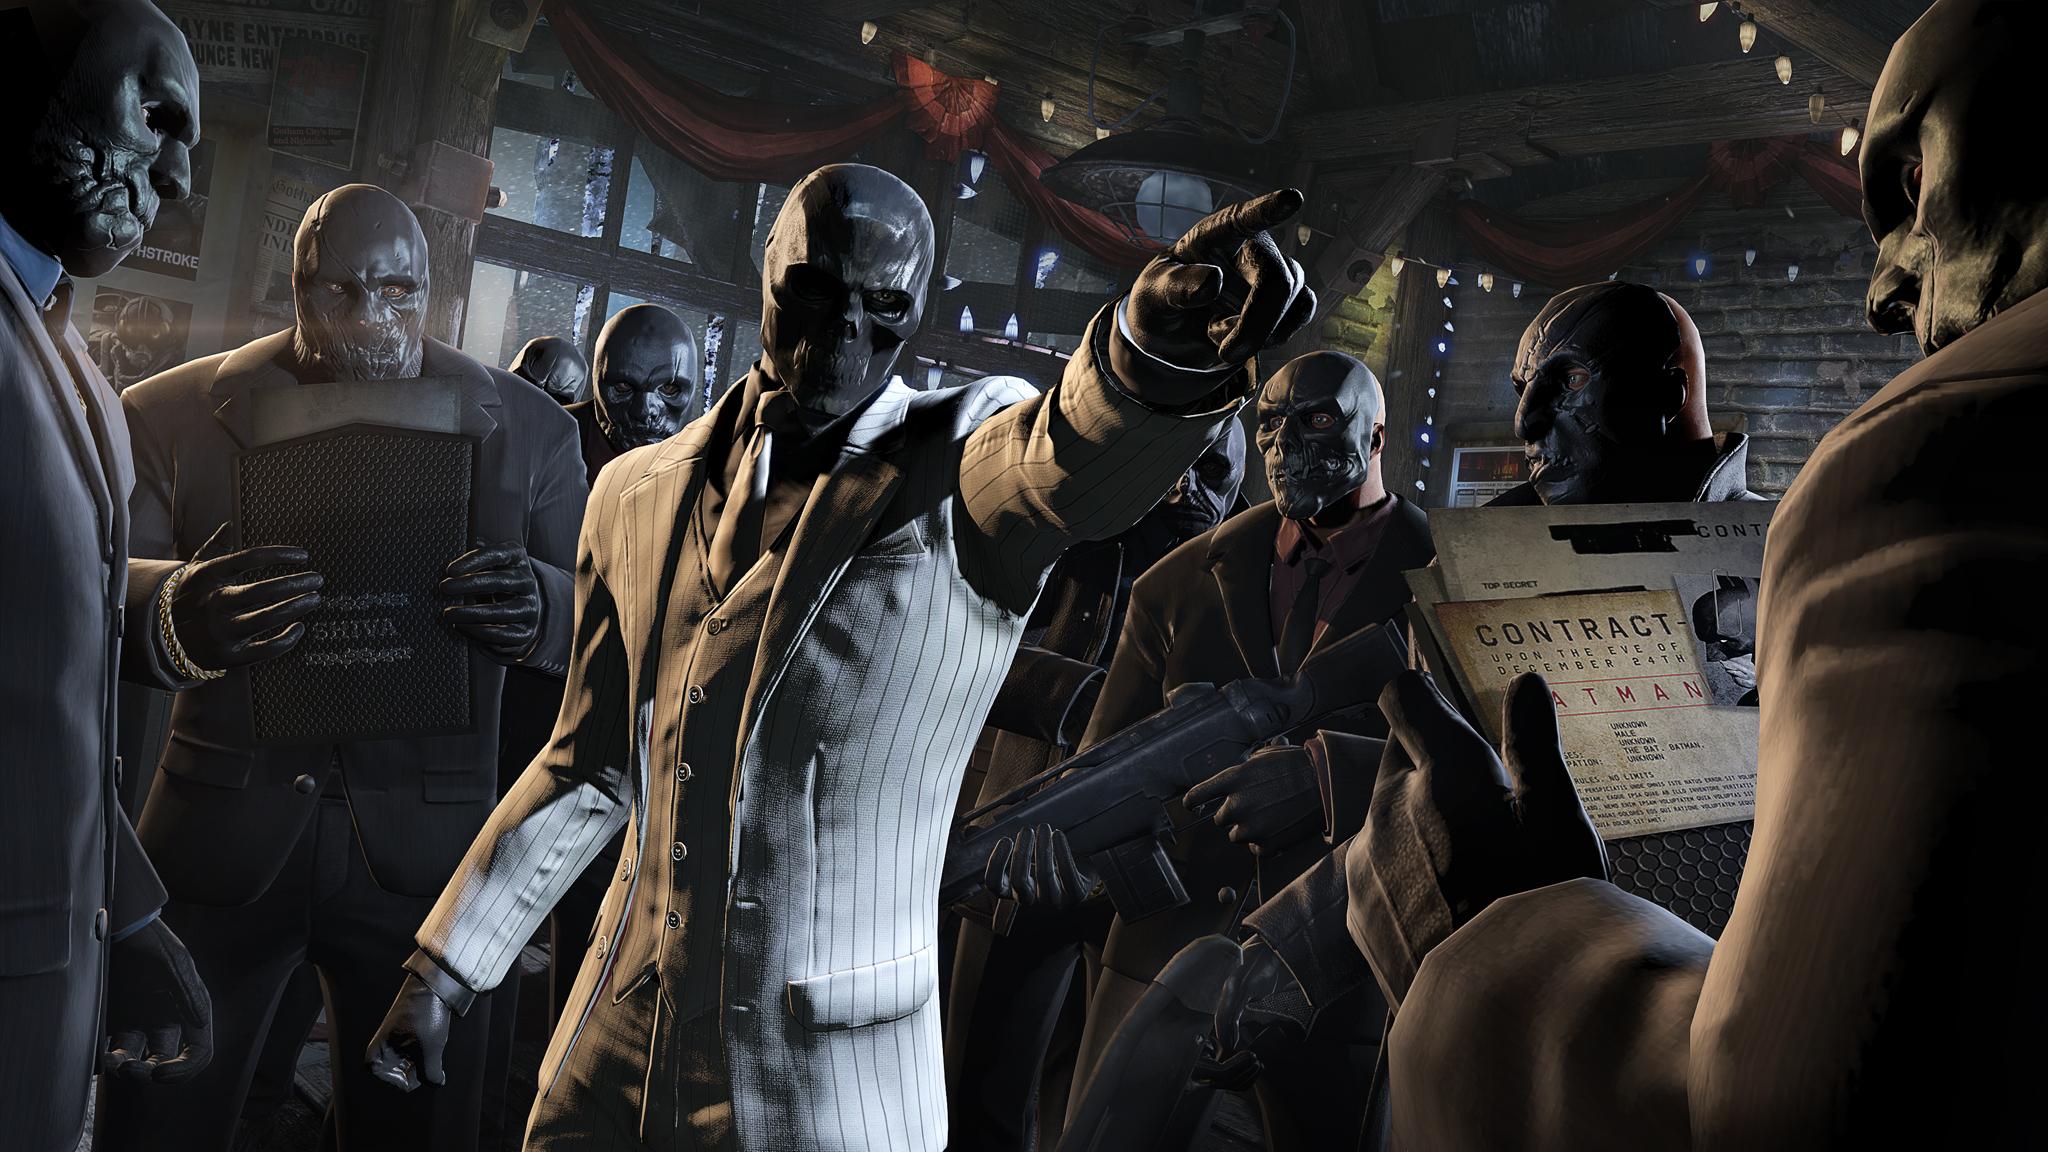 Black Mask's Henchmen